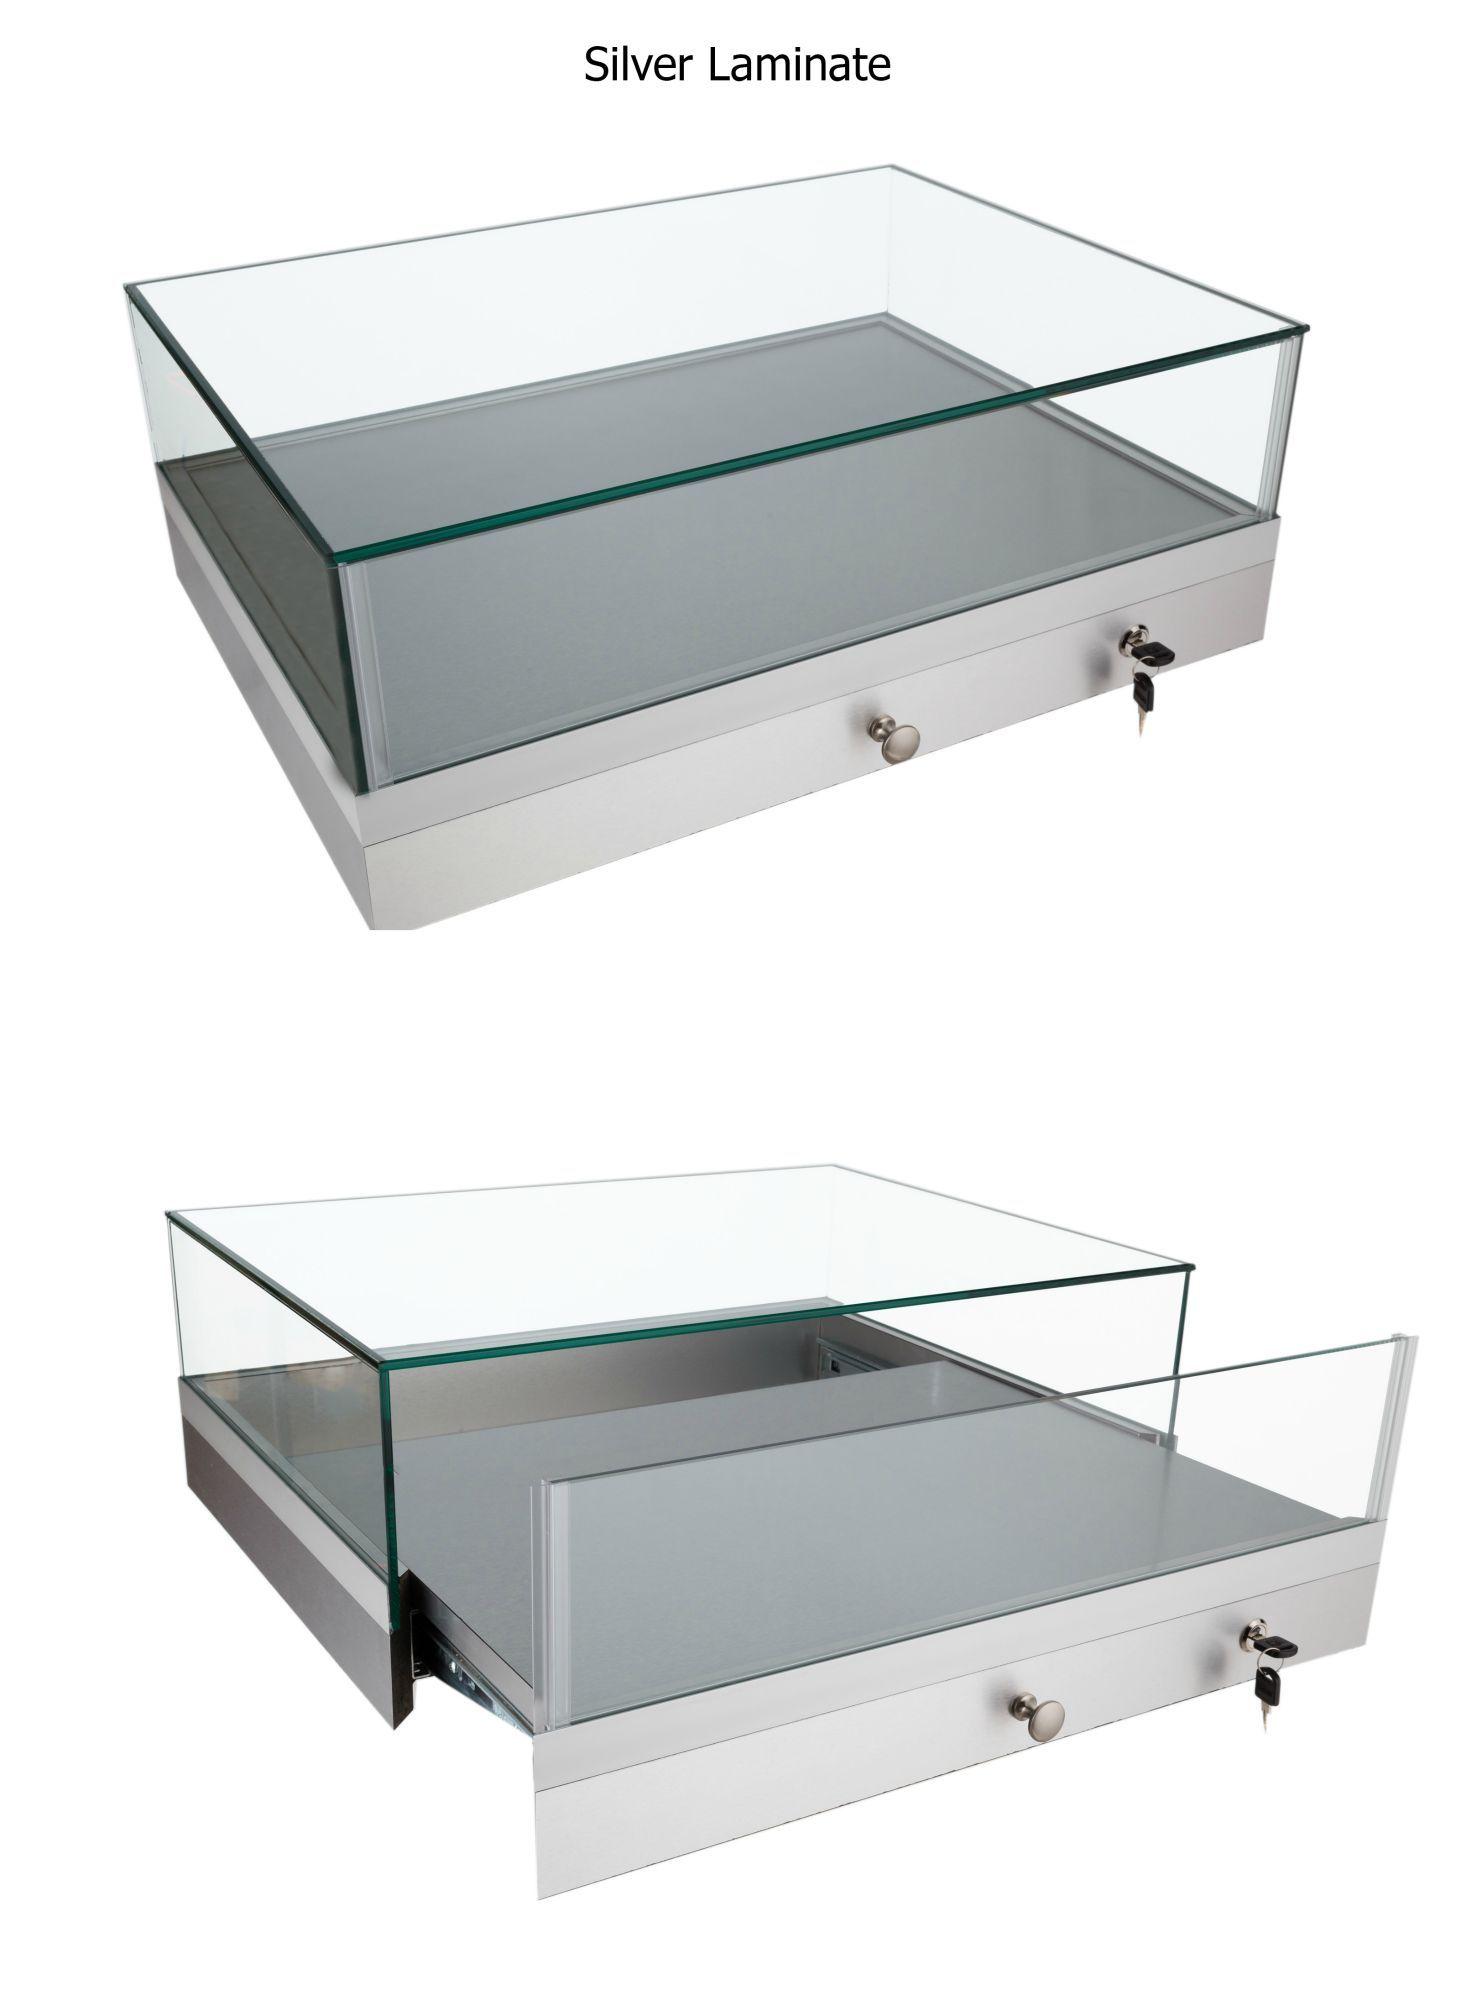 Portable Jewelry Display Case : portable, jewelry, display, GL202, Portable, Countertop, Jewelry, Store, Design,, Jewellery, Interior